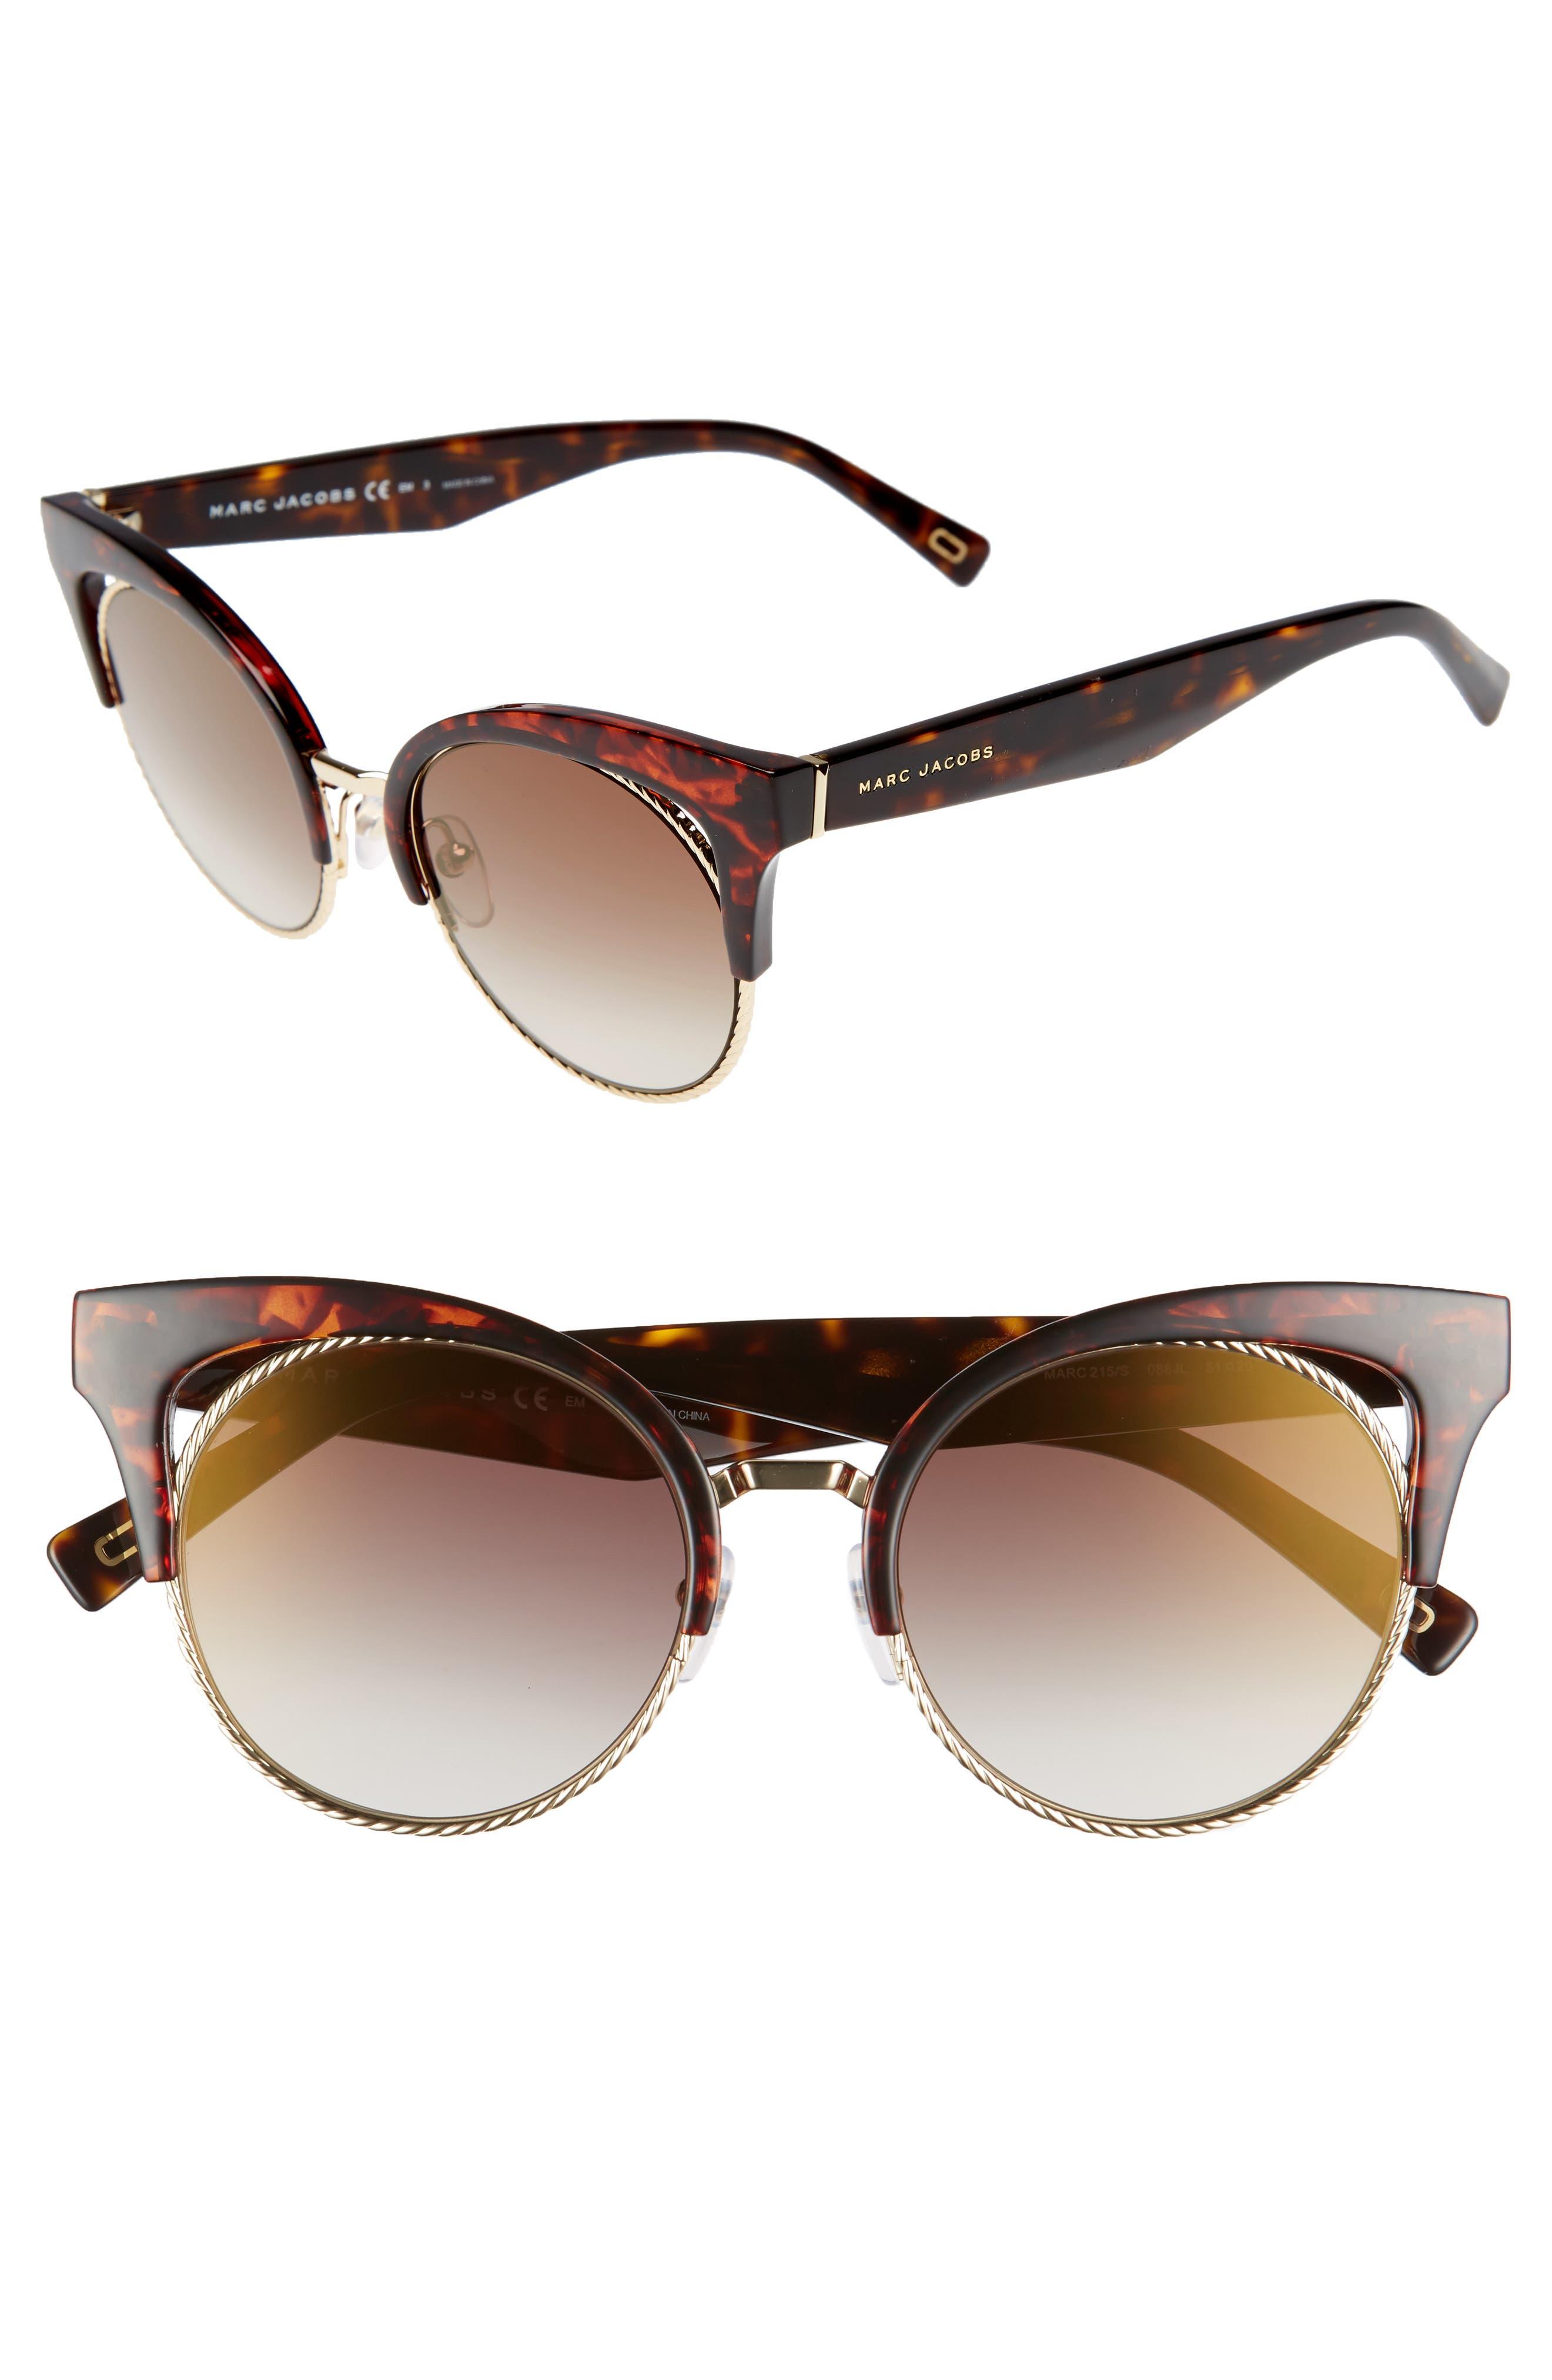 51mm Gradient Lens Cat Eye Sunglasses,                         Main,                         color, Dark Havana